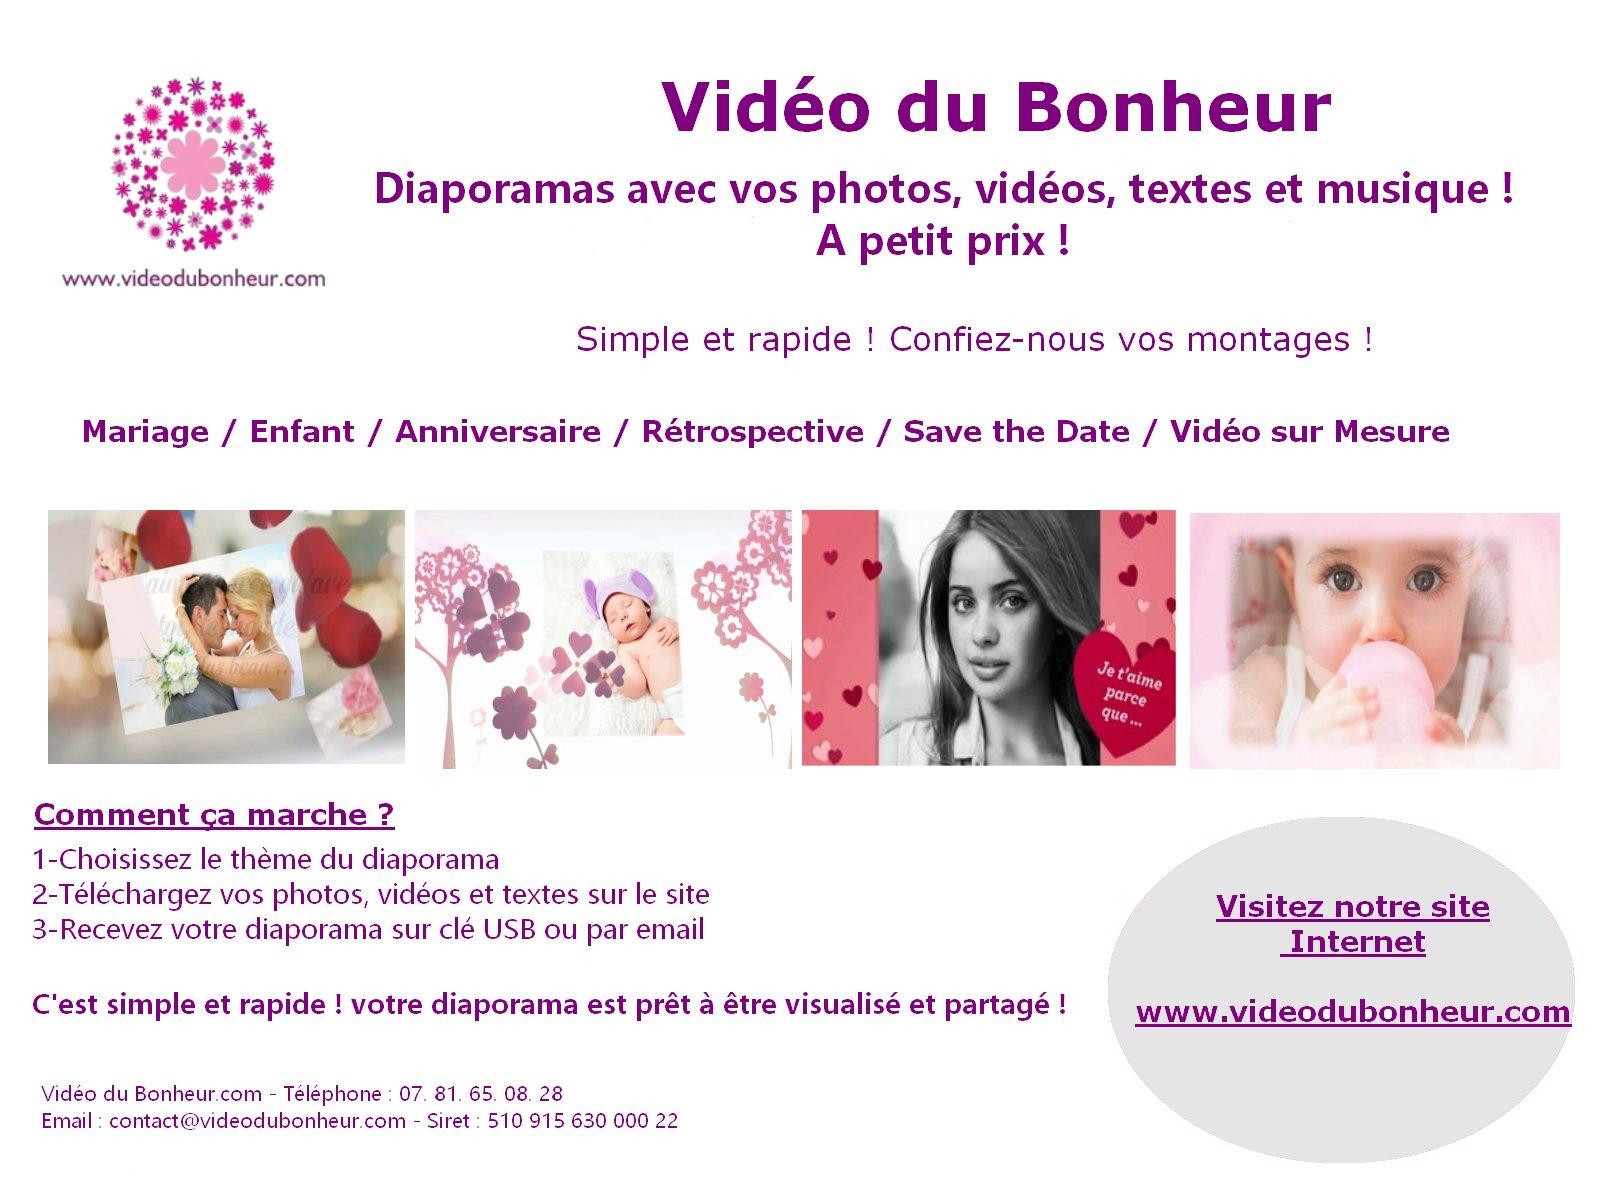 Vidéo du Bonheur.com